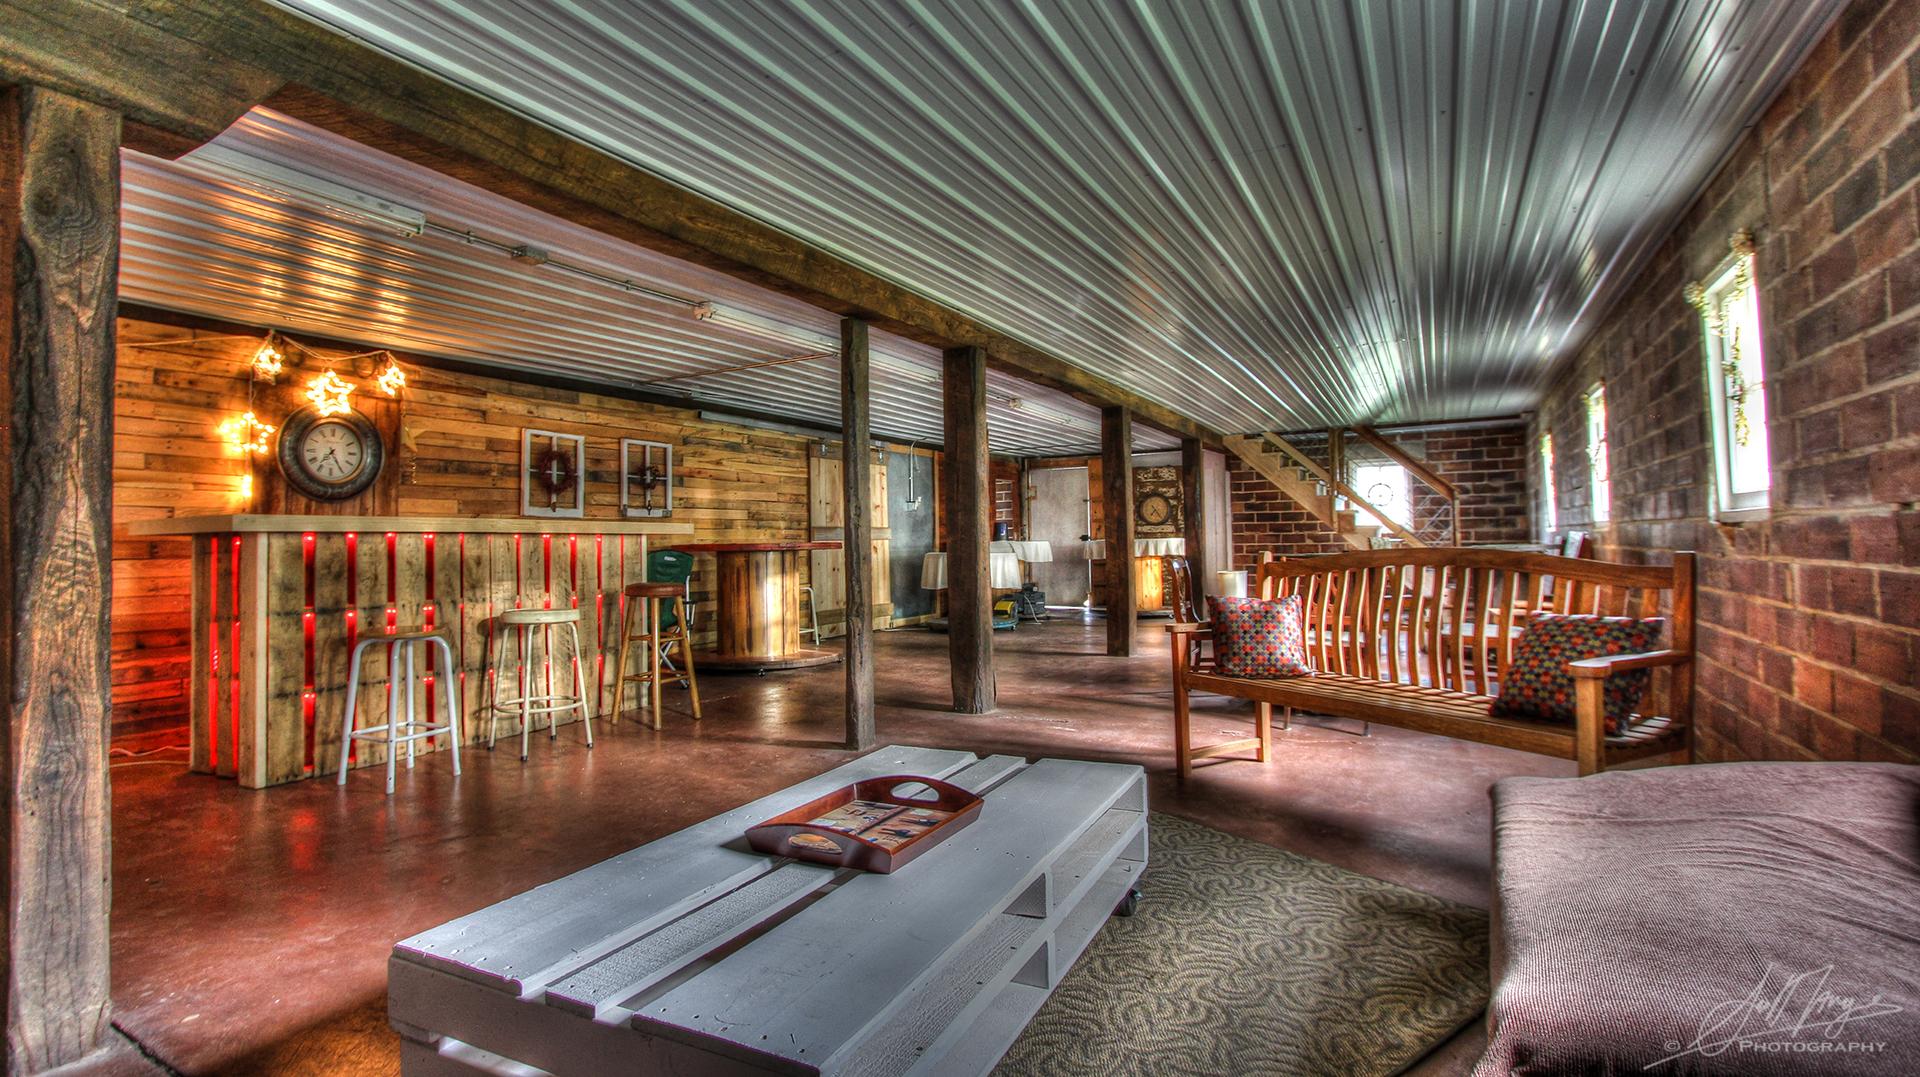 North Star Farm Event Center Le Sueur MN Rustic